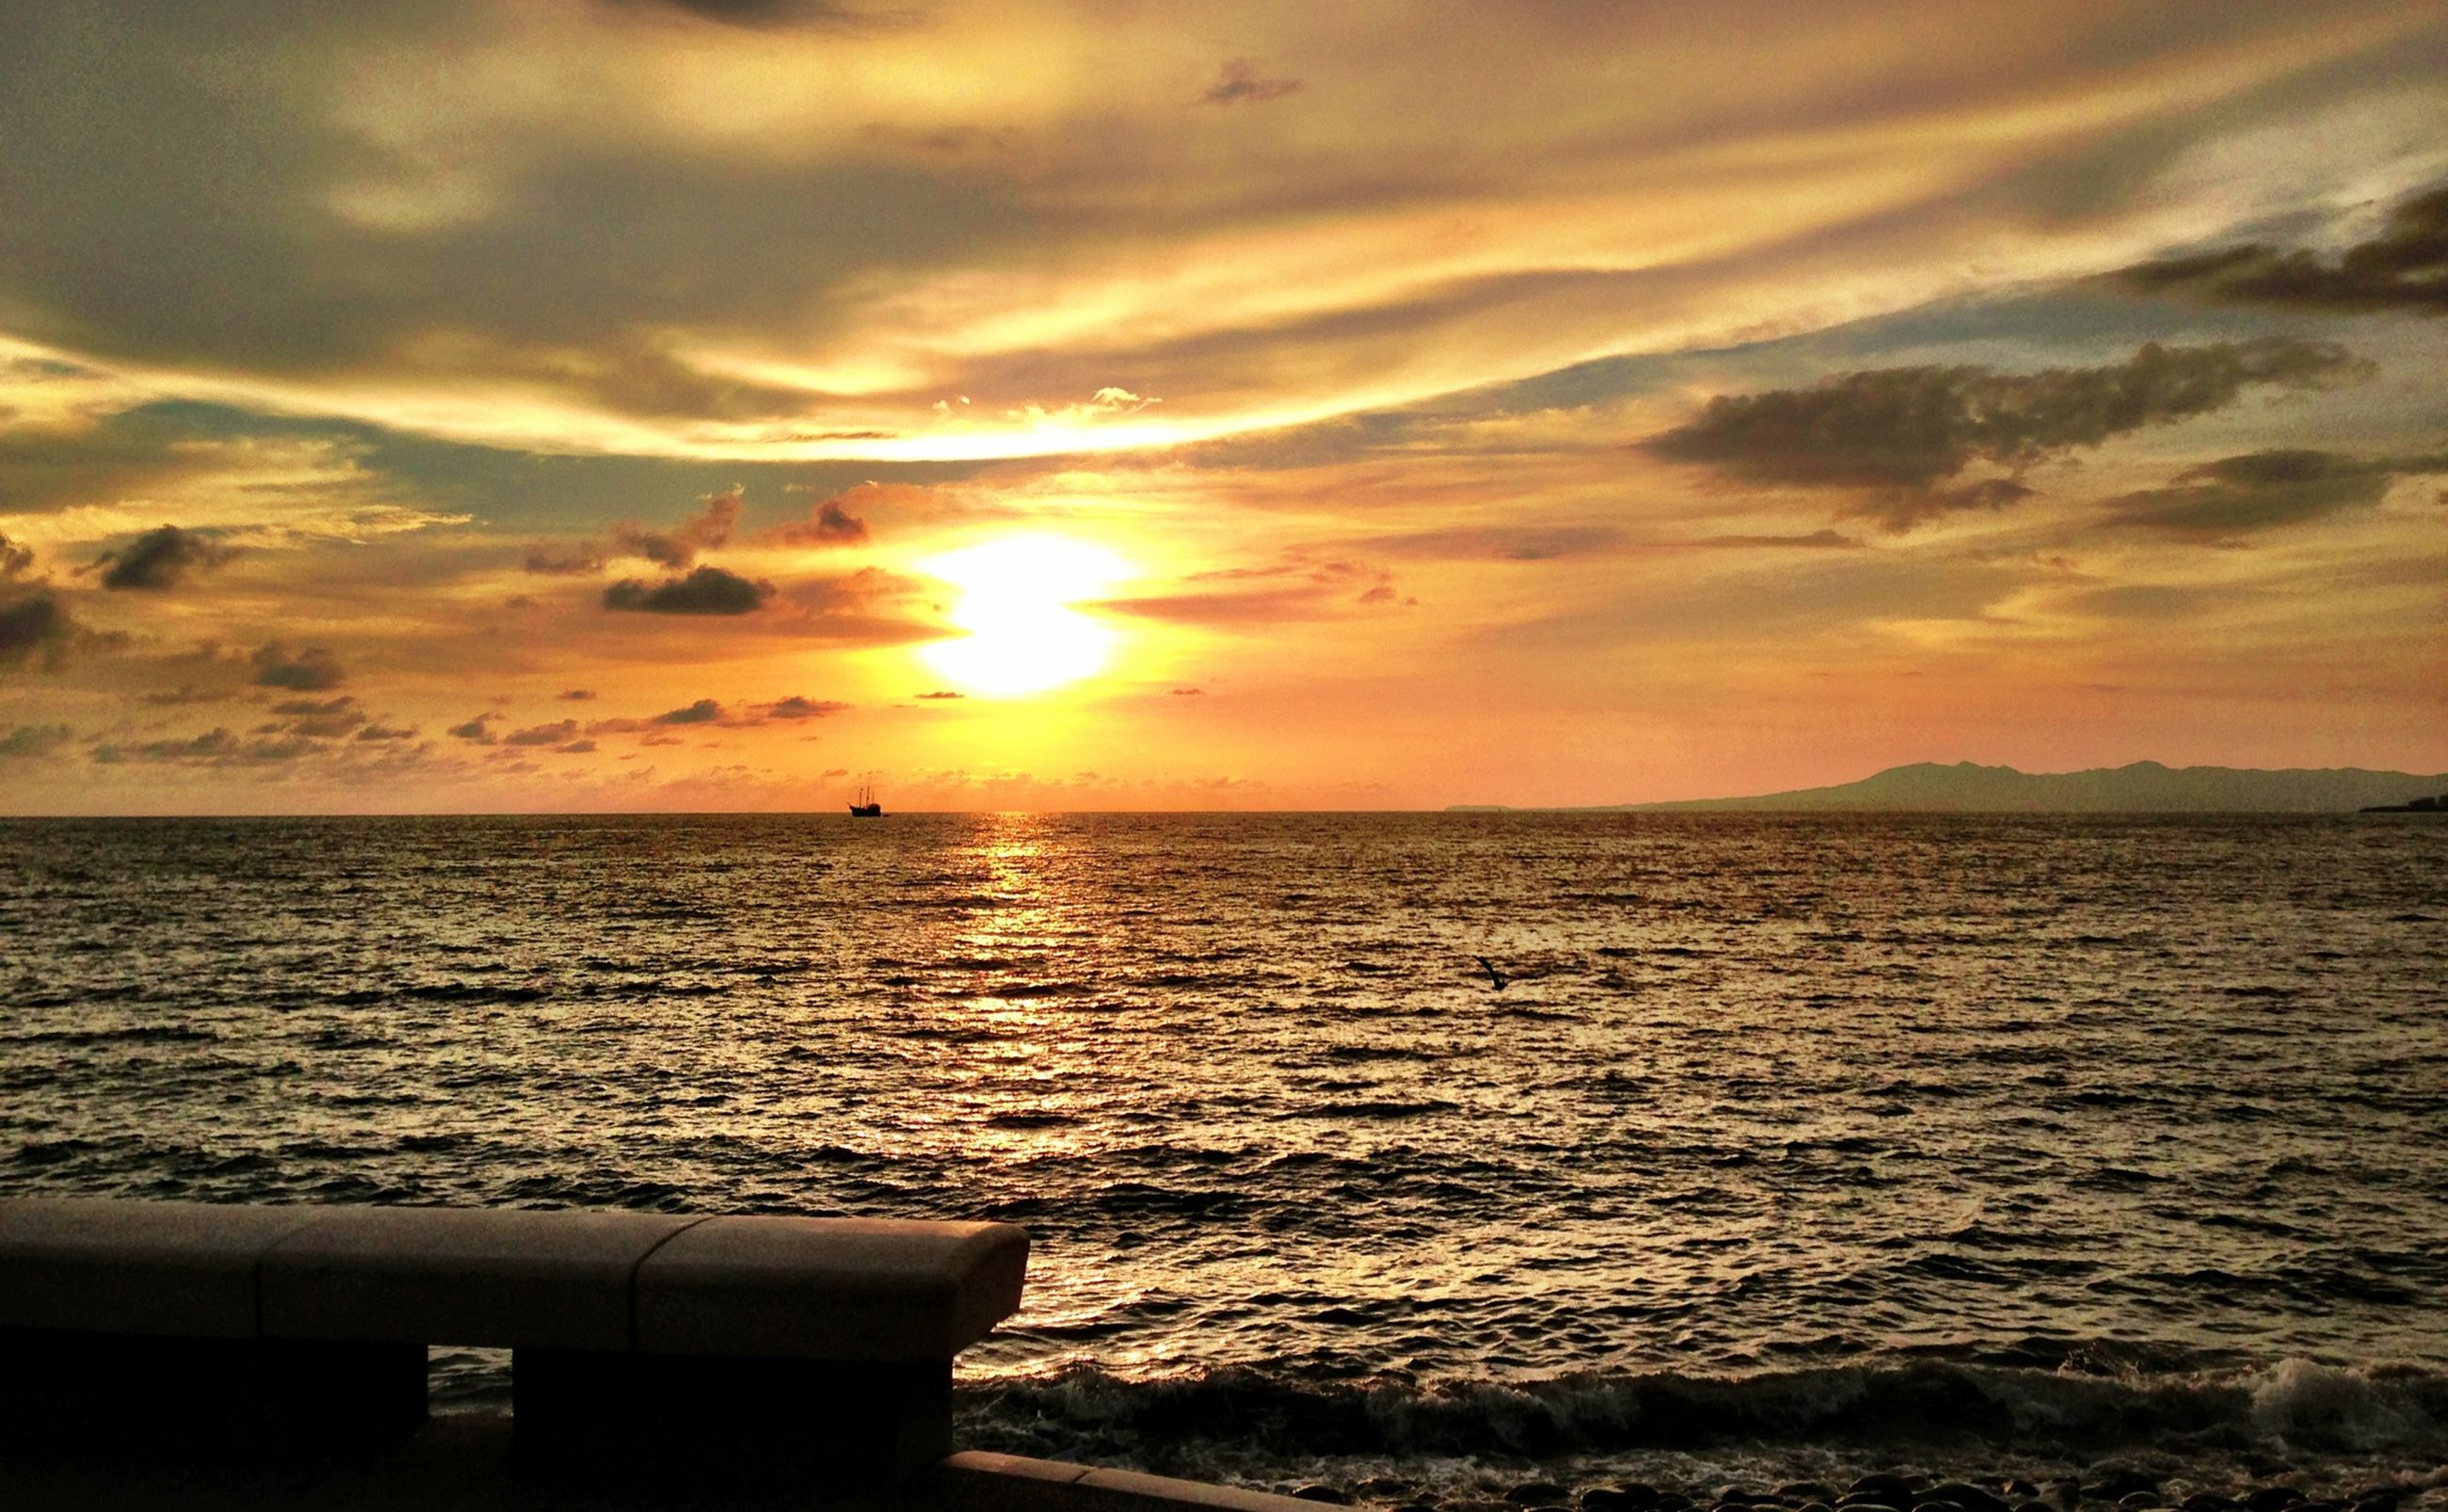 sunset, sea, water, horizon over water, sun, scenics, sky, beauty in nature, tranquil scene, orange color, tranquility, idyllic, cloud - sky, nature, rippled, sunlight, cloud, beach, seascape, remote